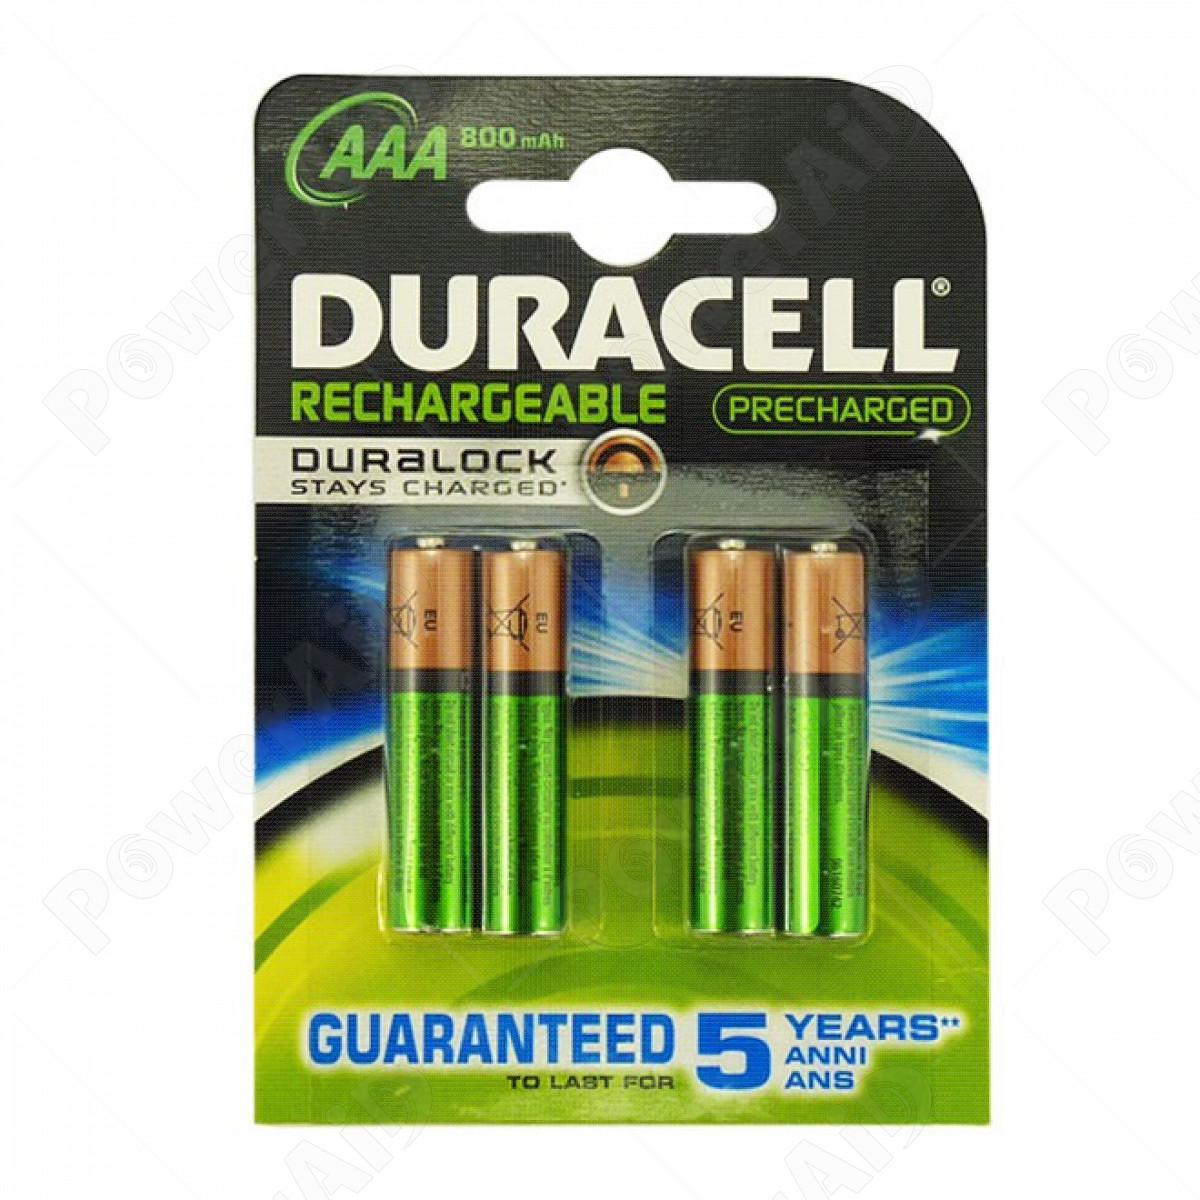 Duracell - 4 Batterie Ministilo AAA ricaricabili